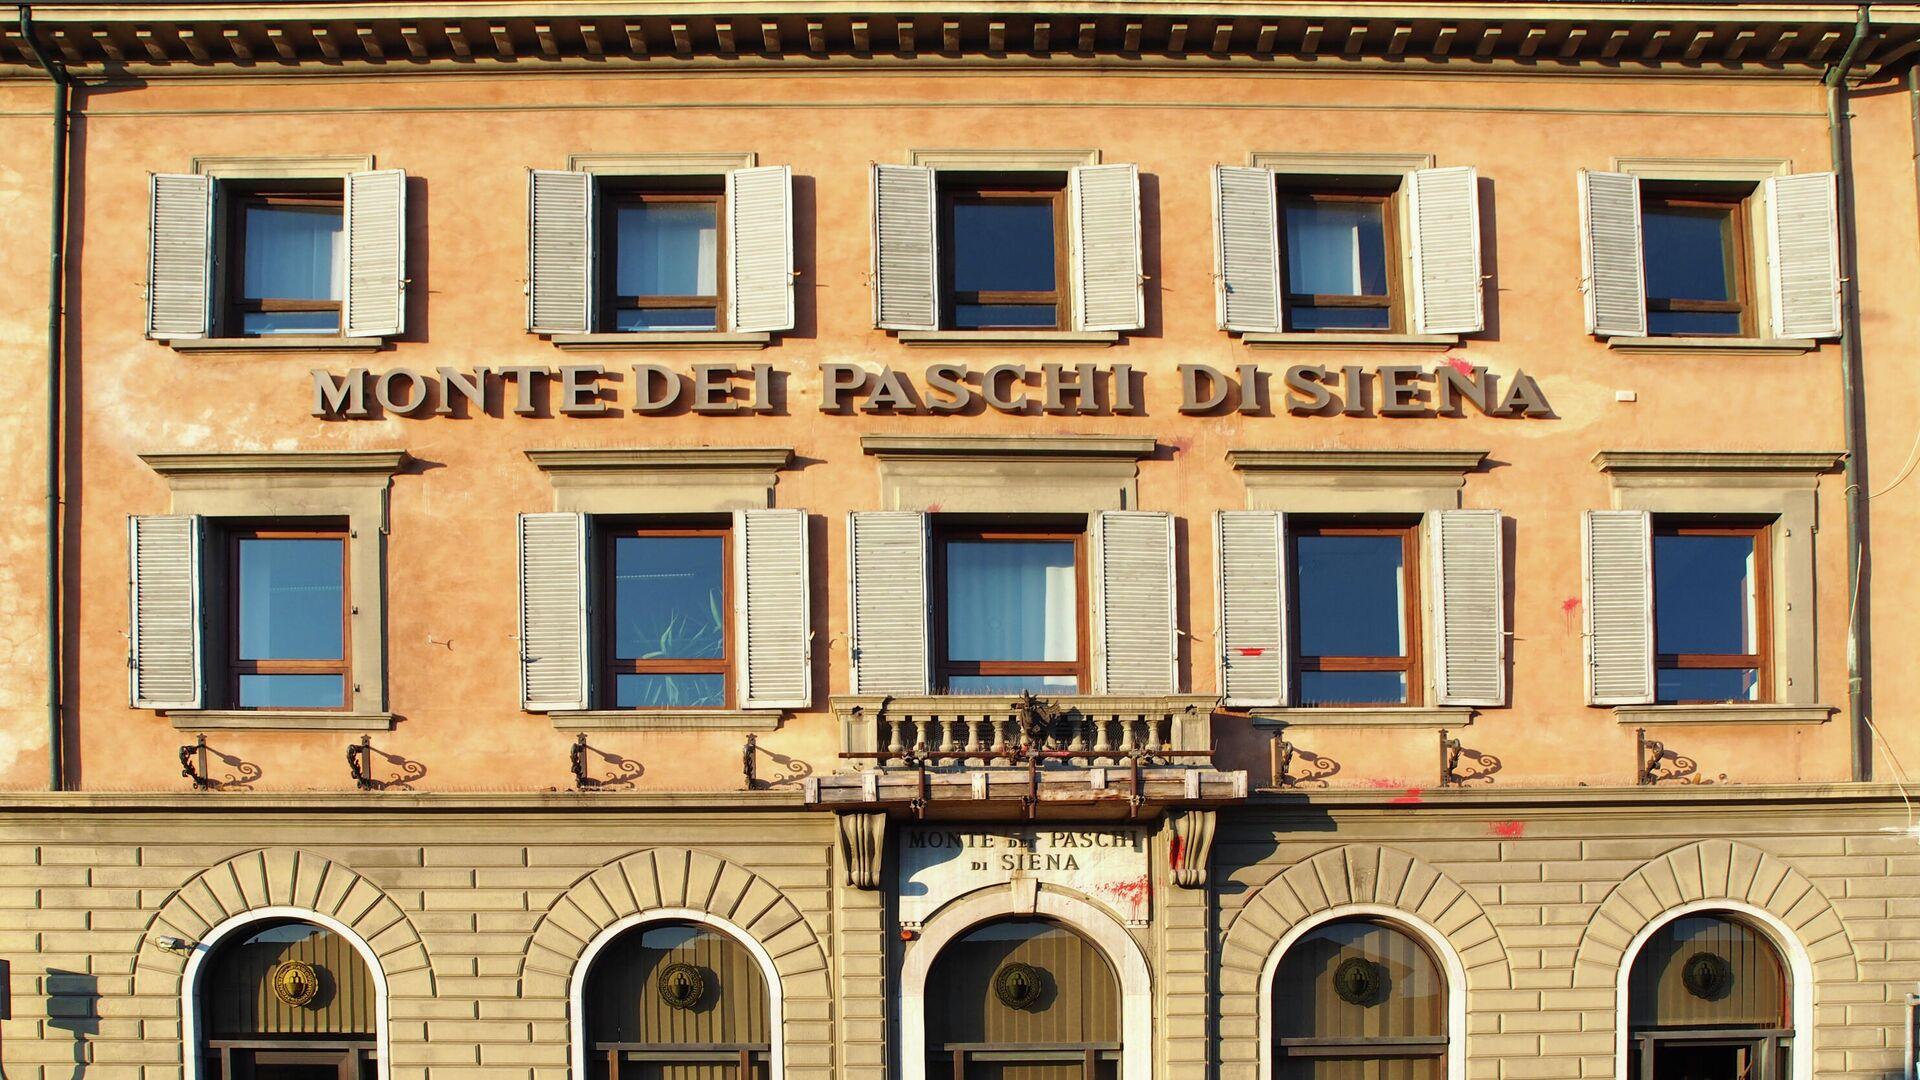 Banca Monte dei Paschi di Siena - Sputnik Mundo, 1920, 19.03.2021